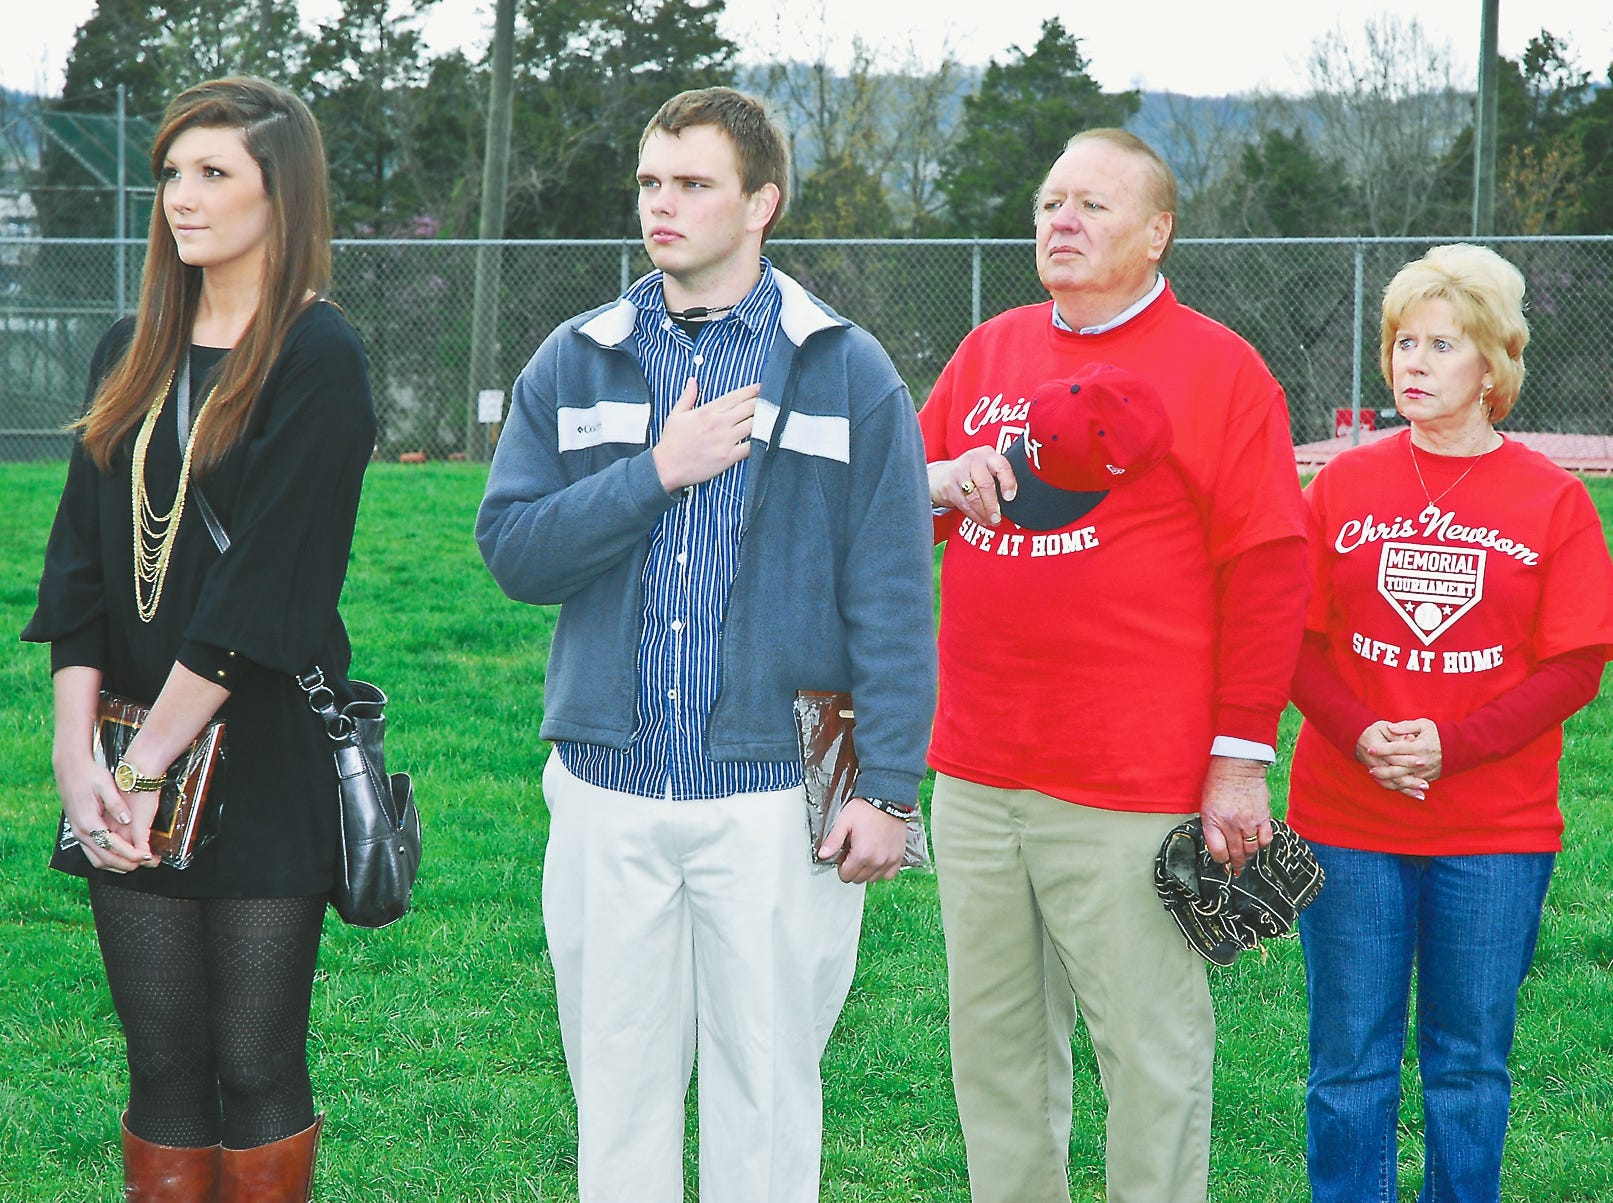 Halls High seniors Courtney White and Daryl Sumlin Jr. were awarded the 2011 Chris Newsom Memorial Tournament scholarship from Hugh and Mary Newsom.